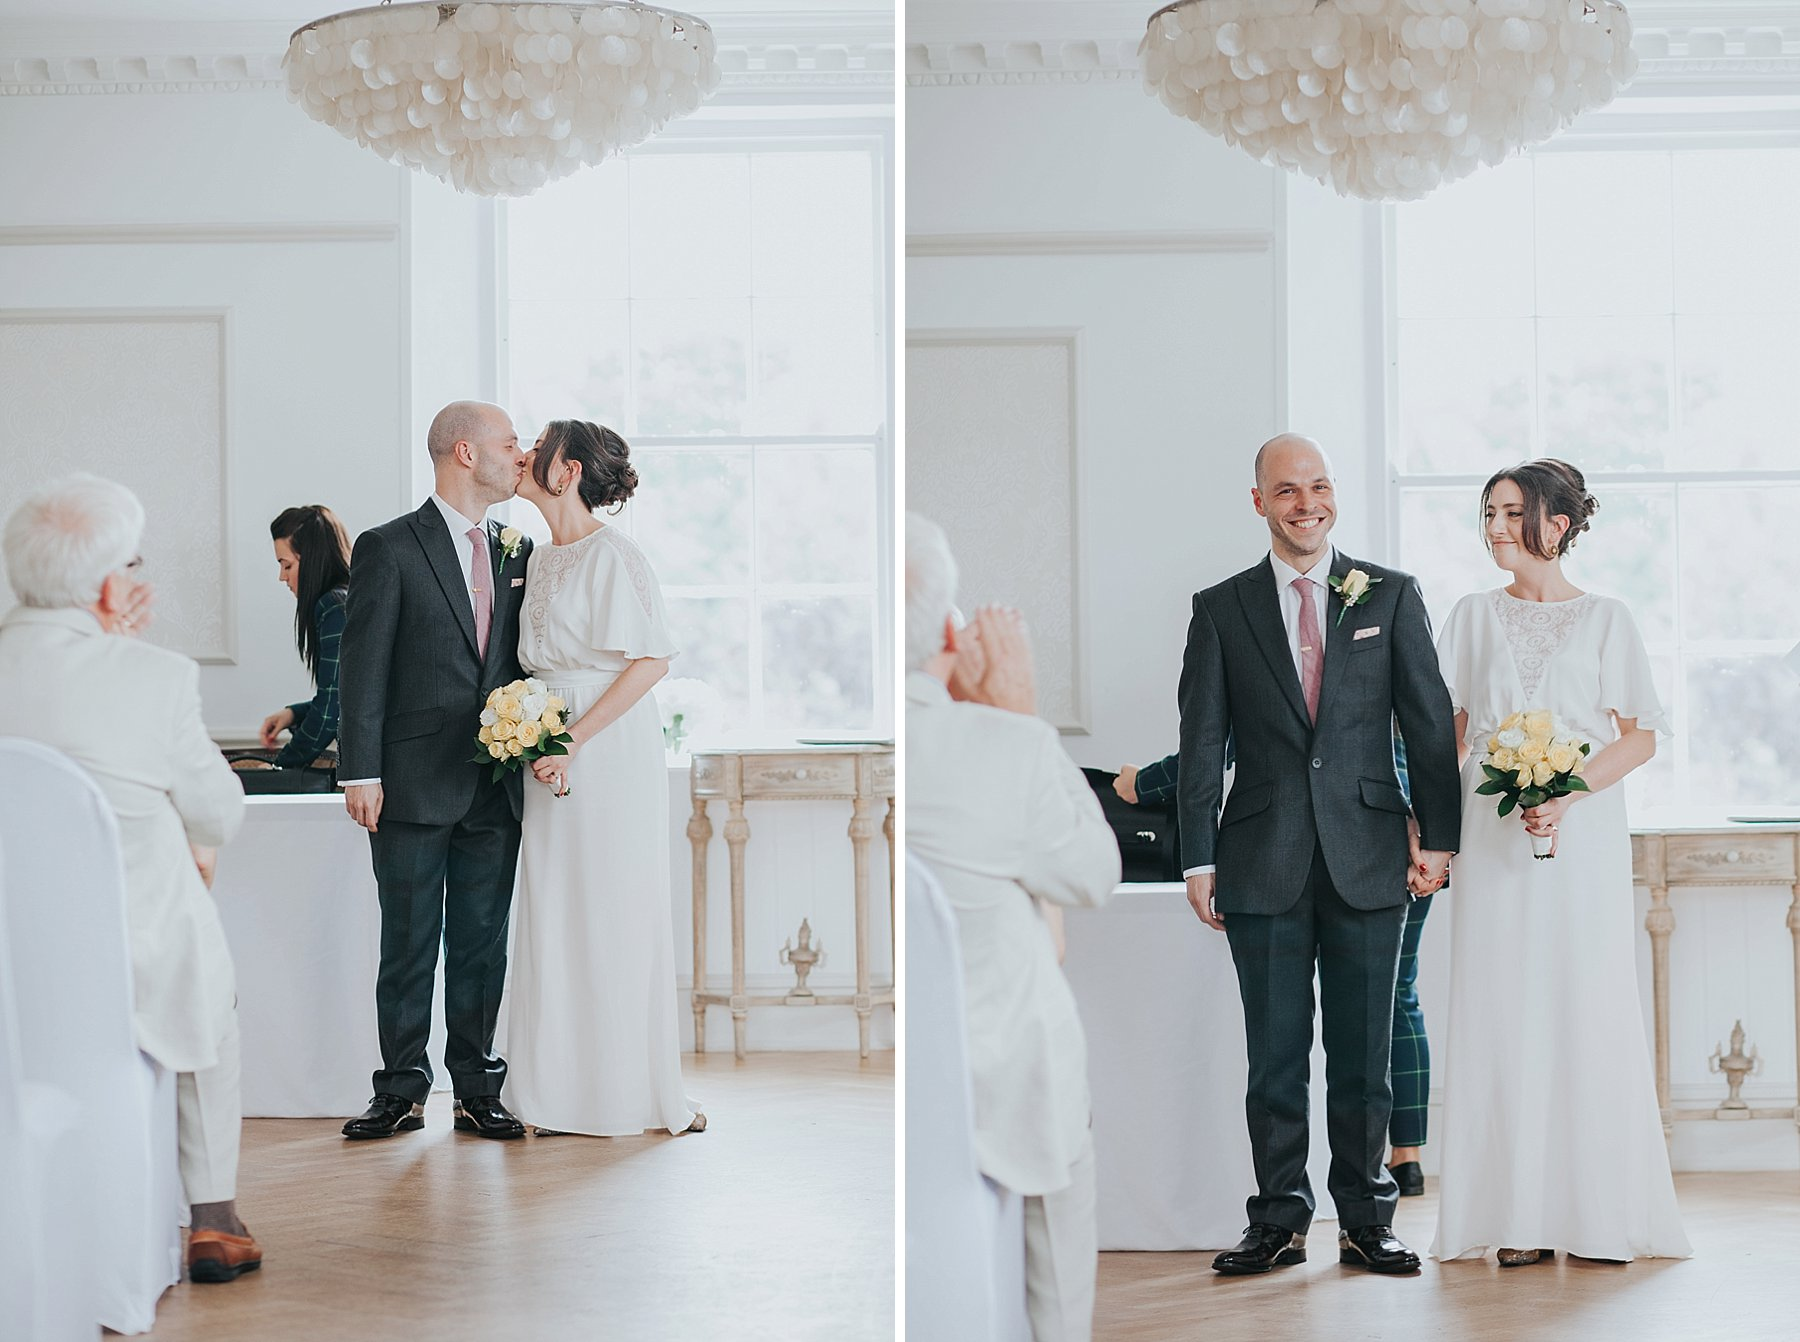 114-Belair House wedding ceremony first kiss.jpg